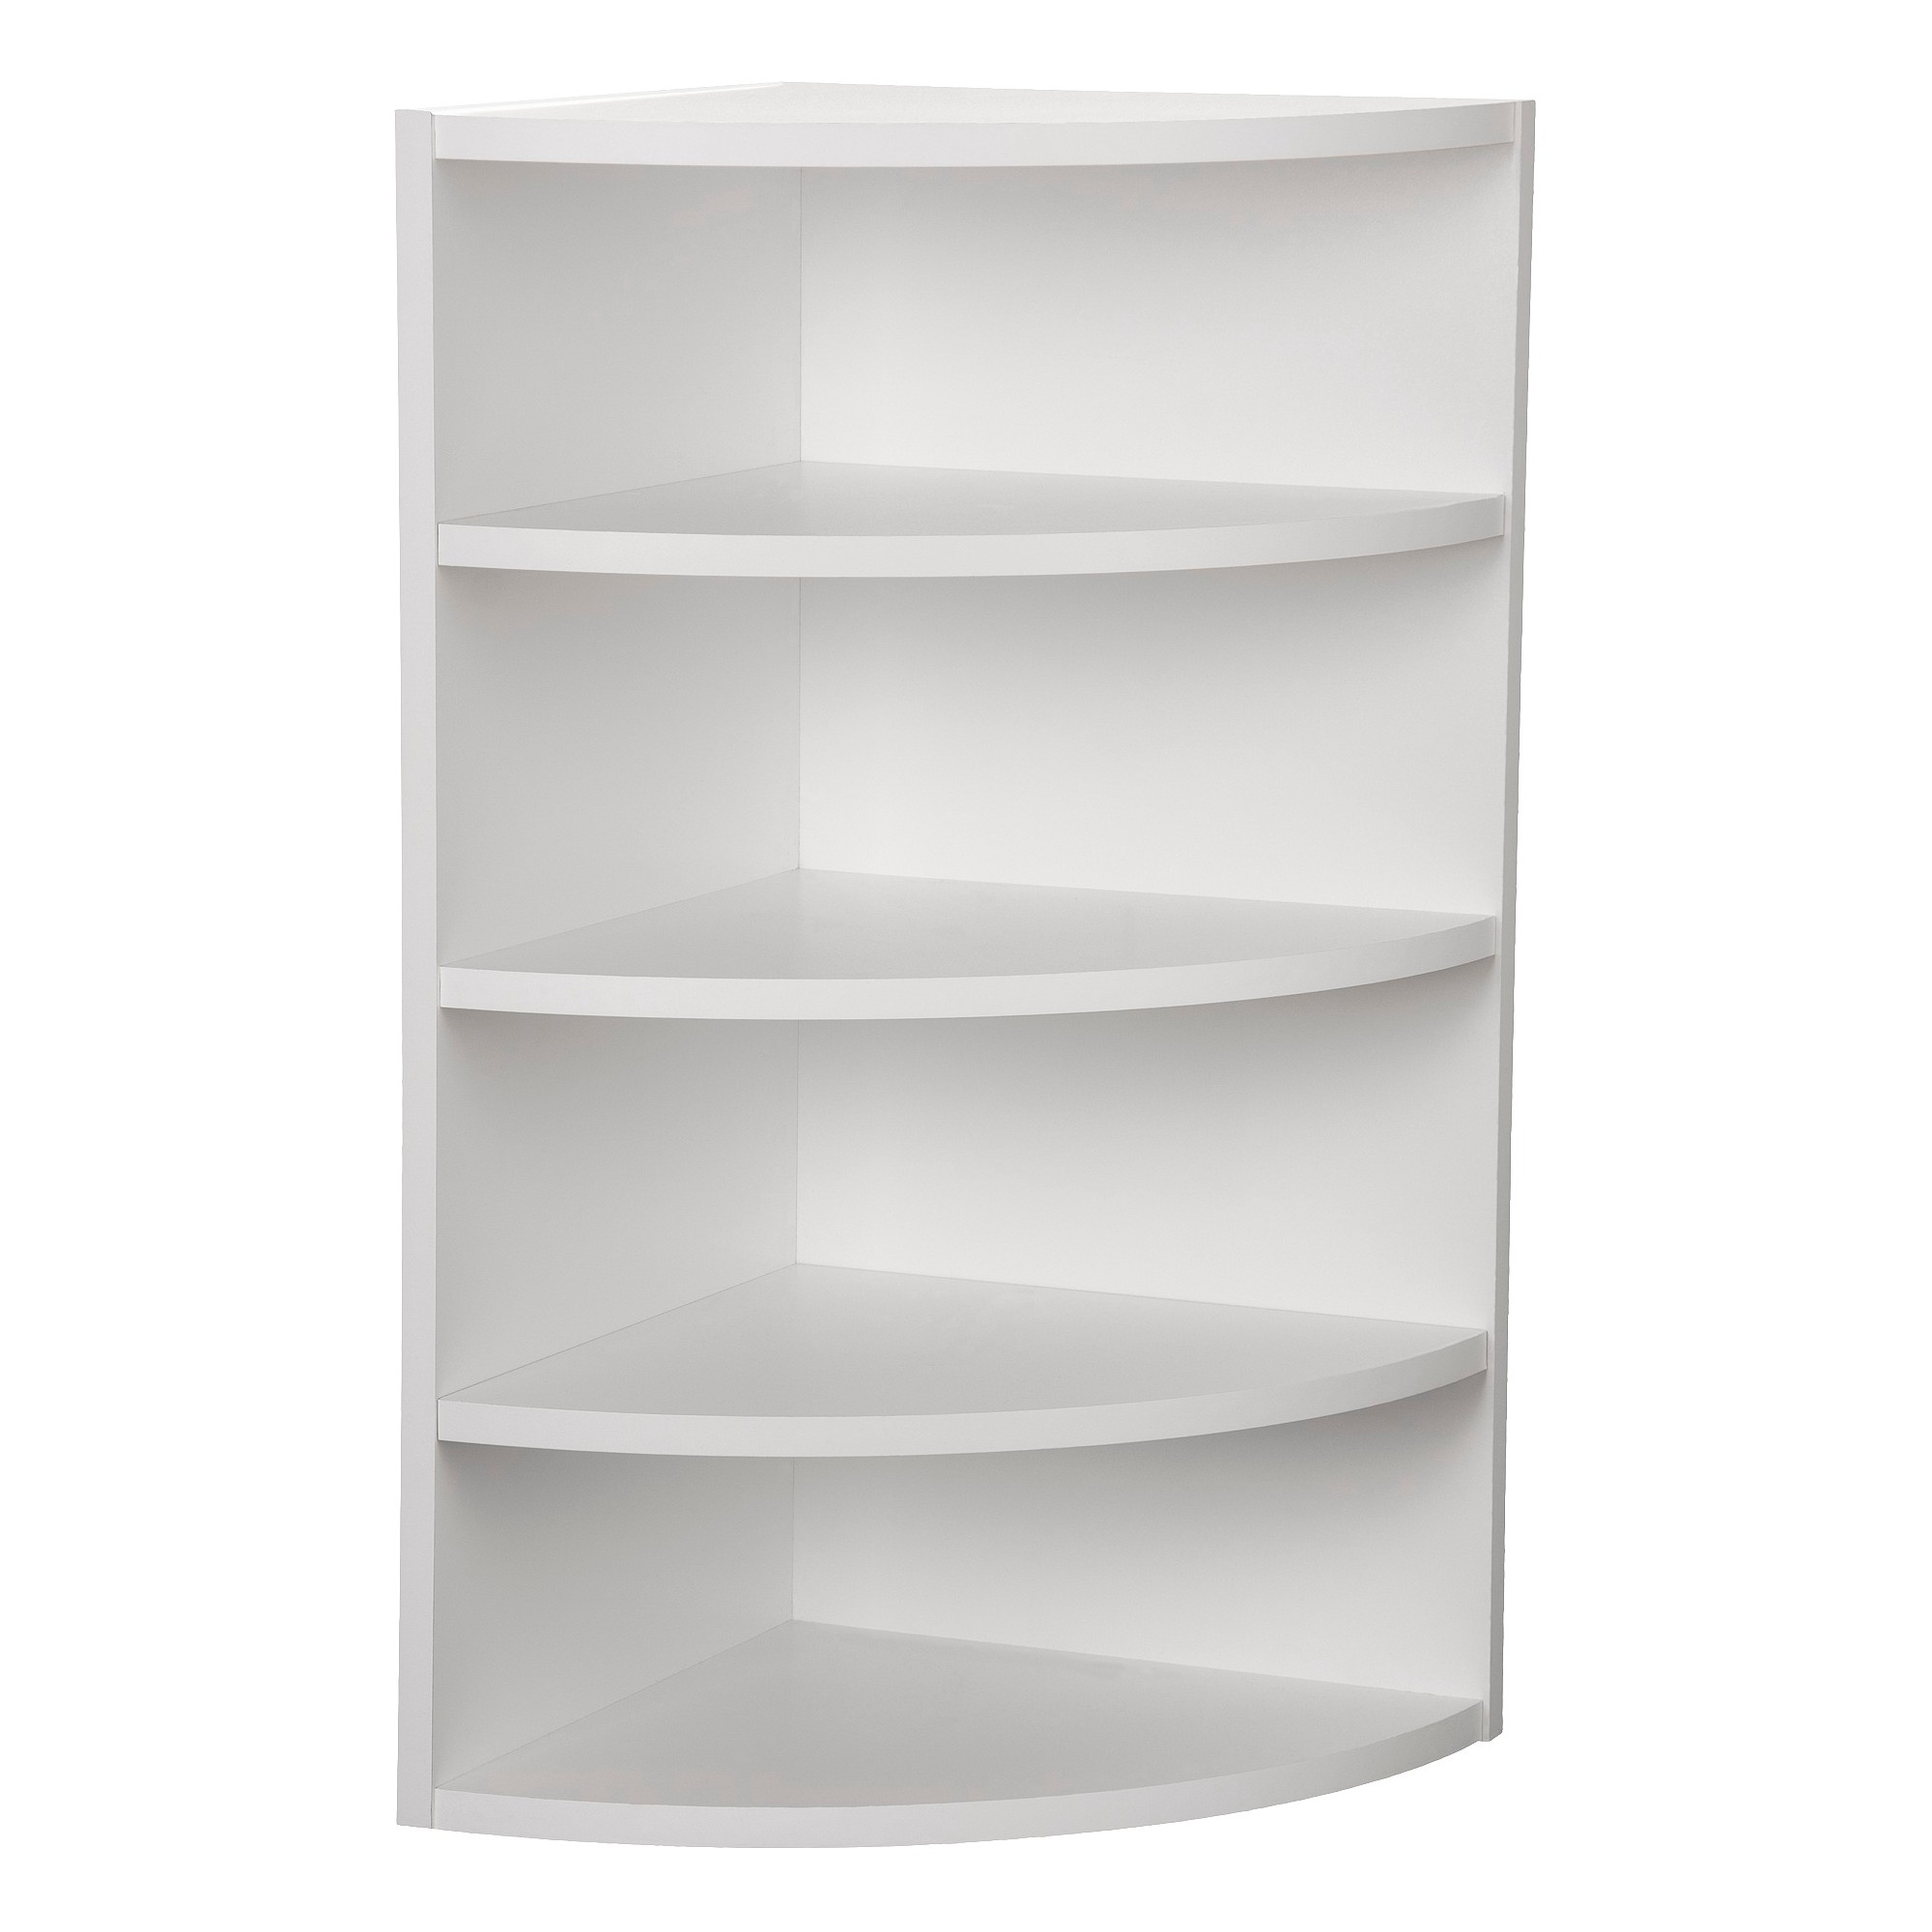 Foremost Corner Radius Cube White (30W) Cube storage